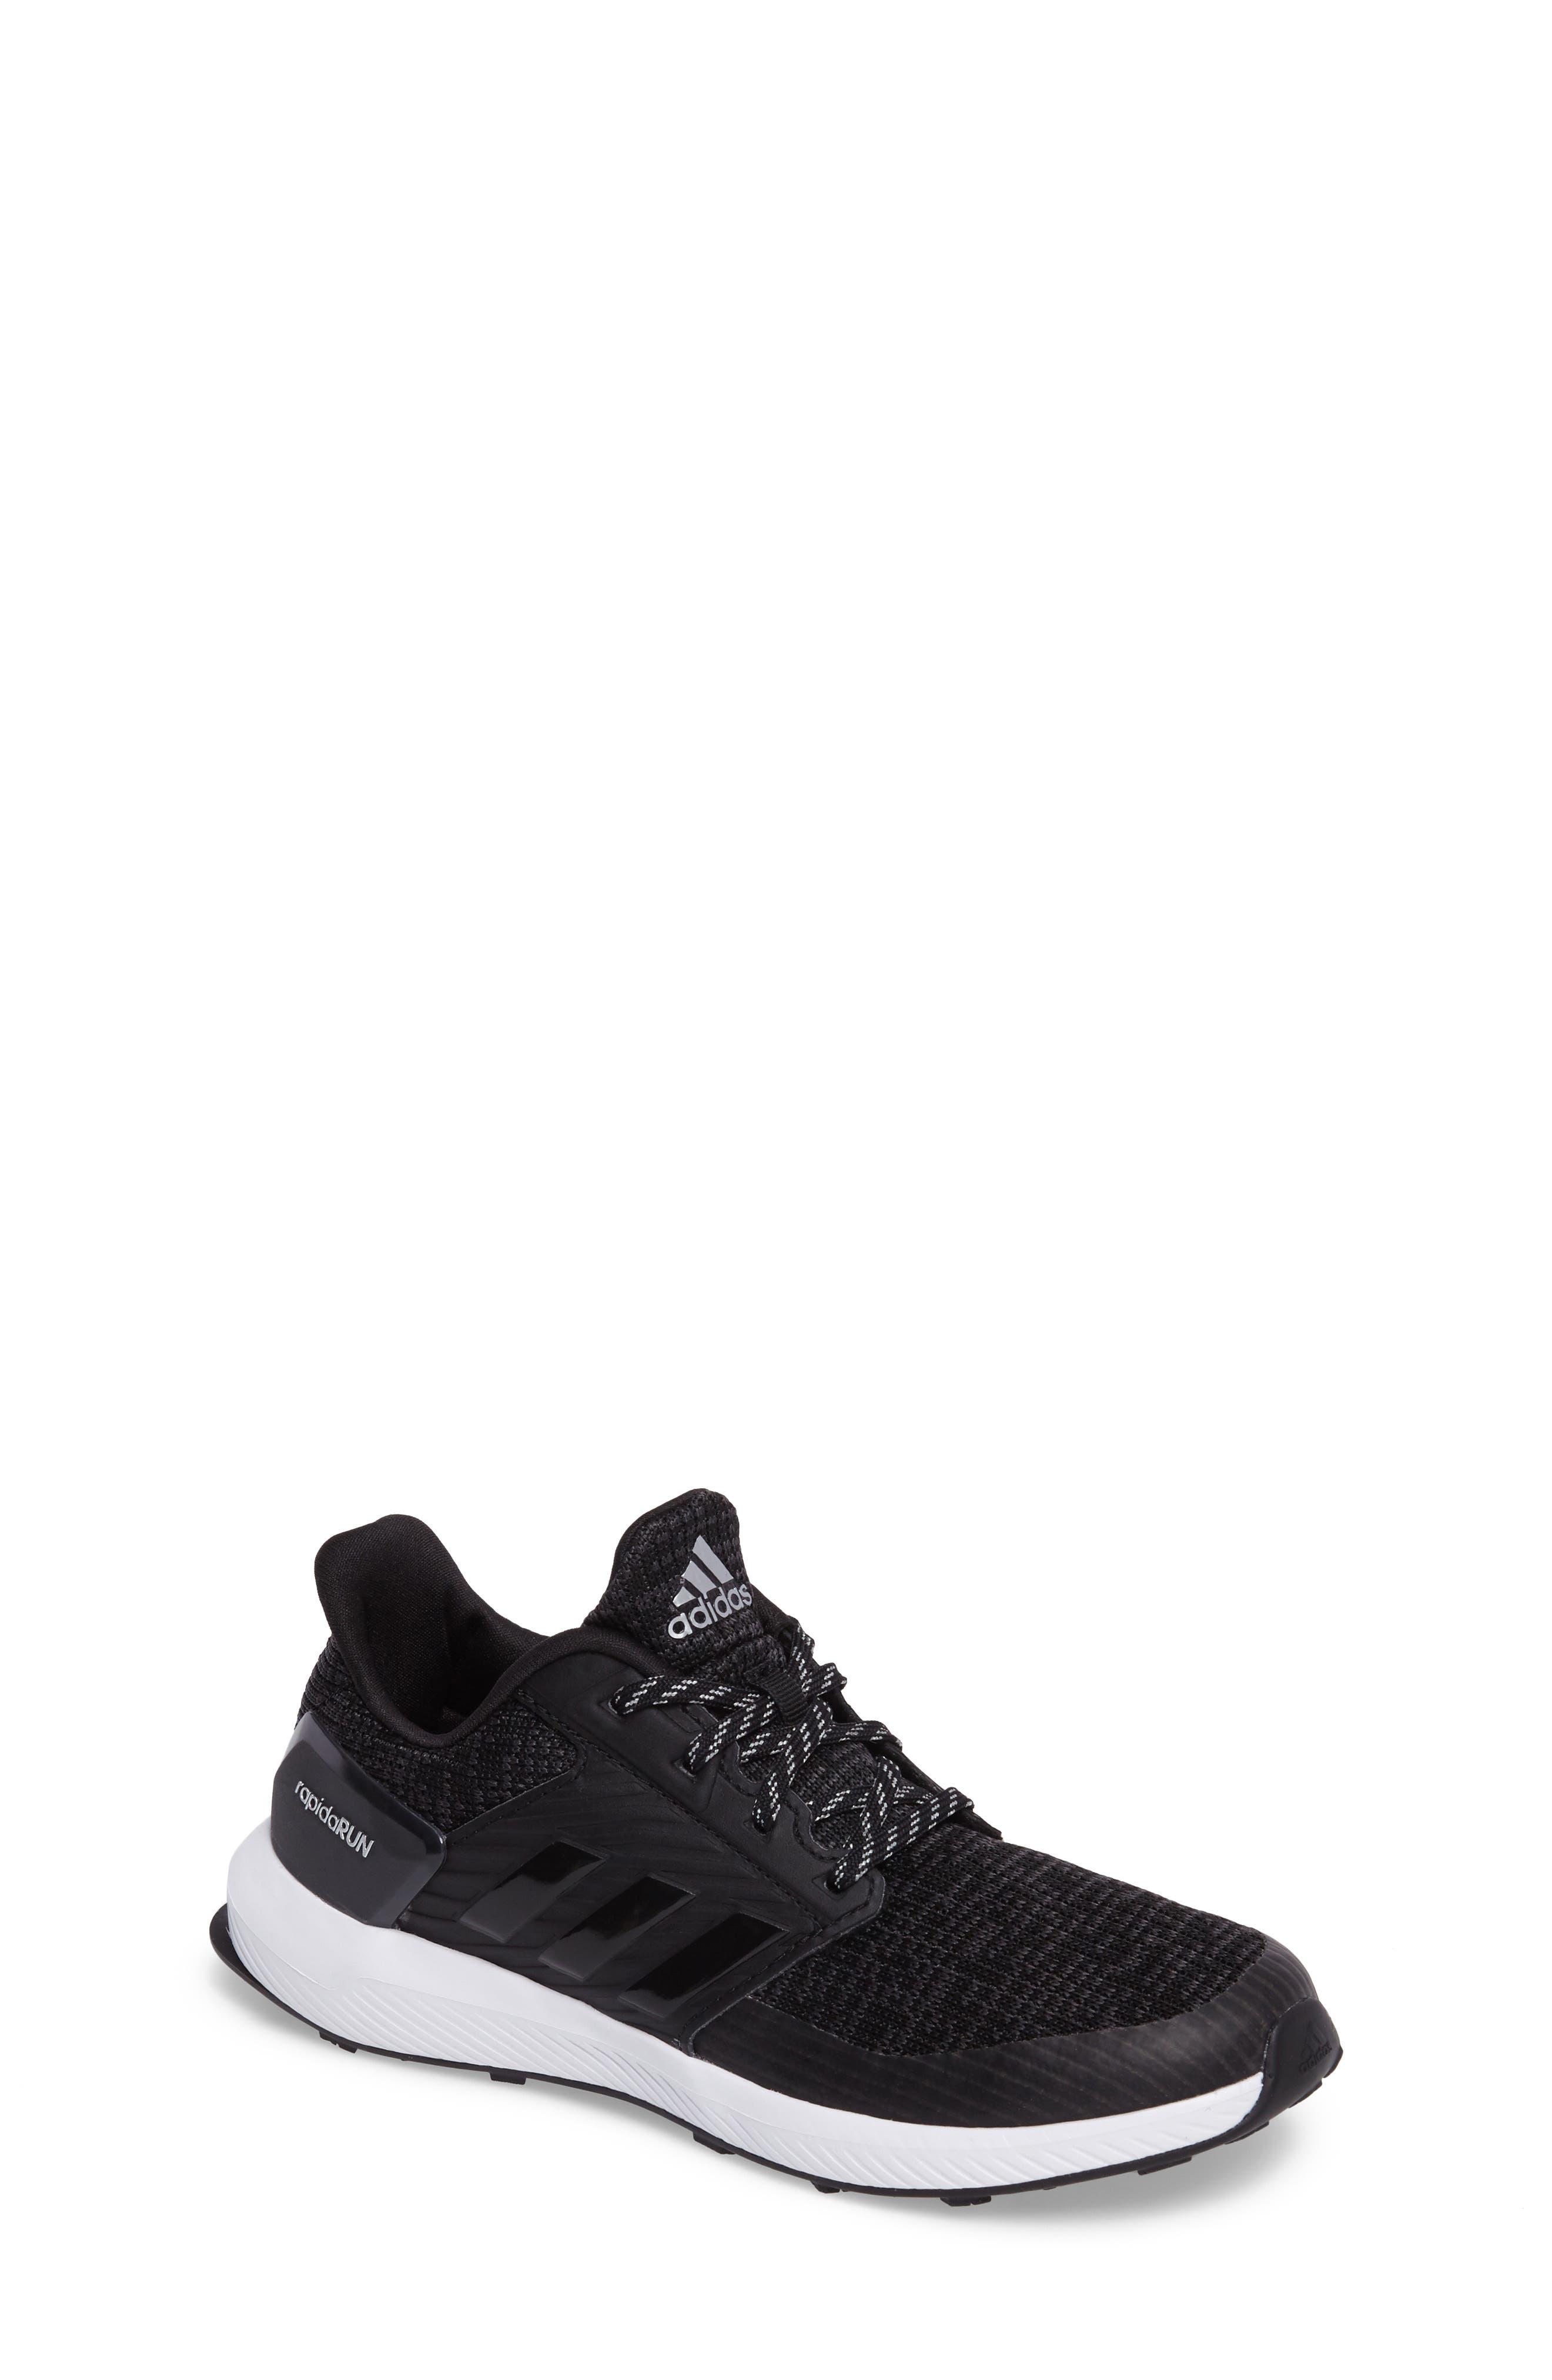 Alternate Image 1 Selected - adidas RapidaRUN Lux Sneaker (Toddler & Little Kid)